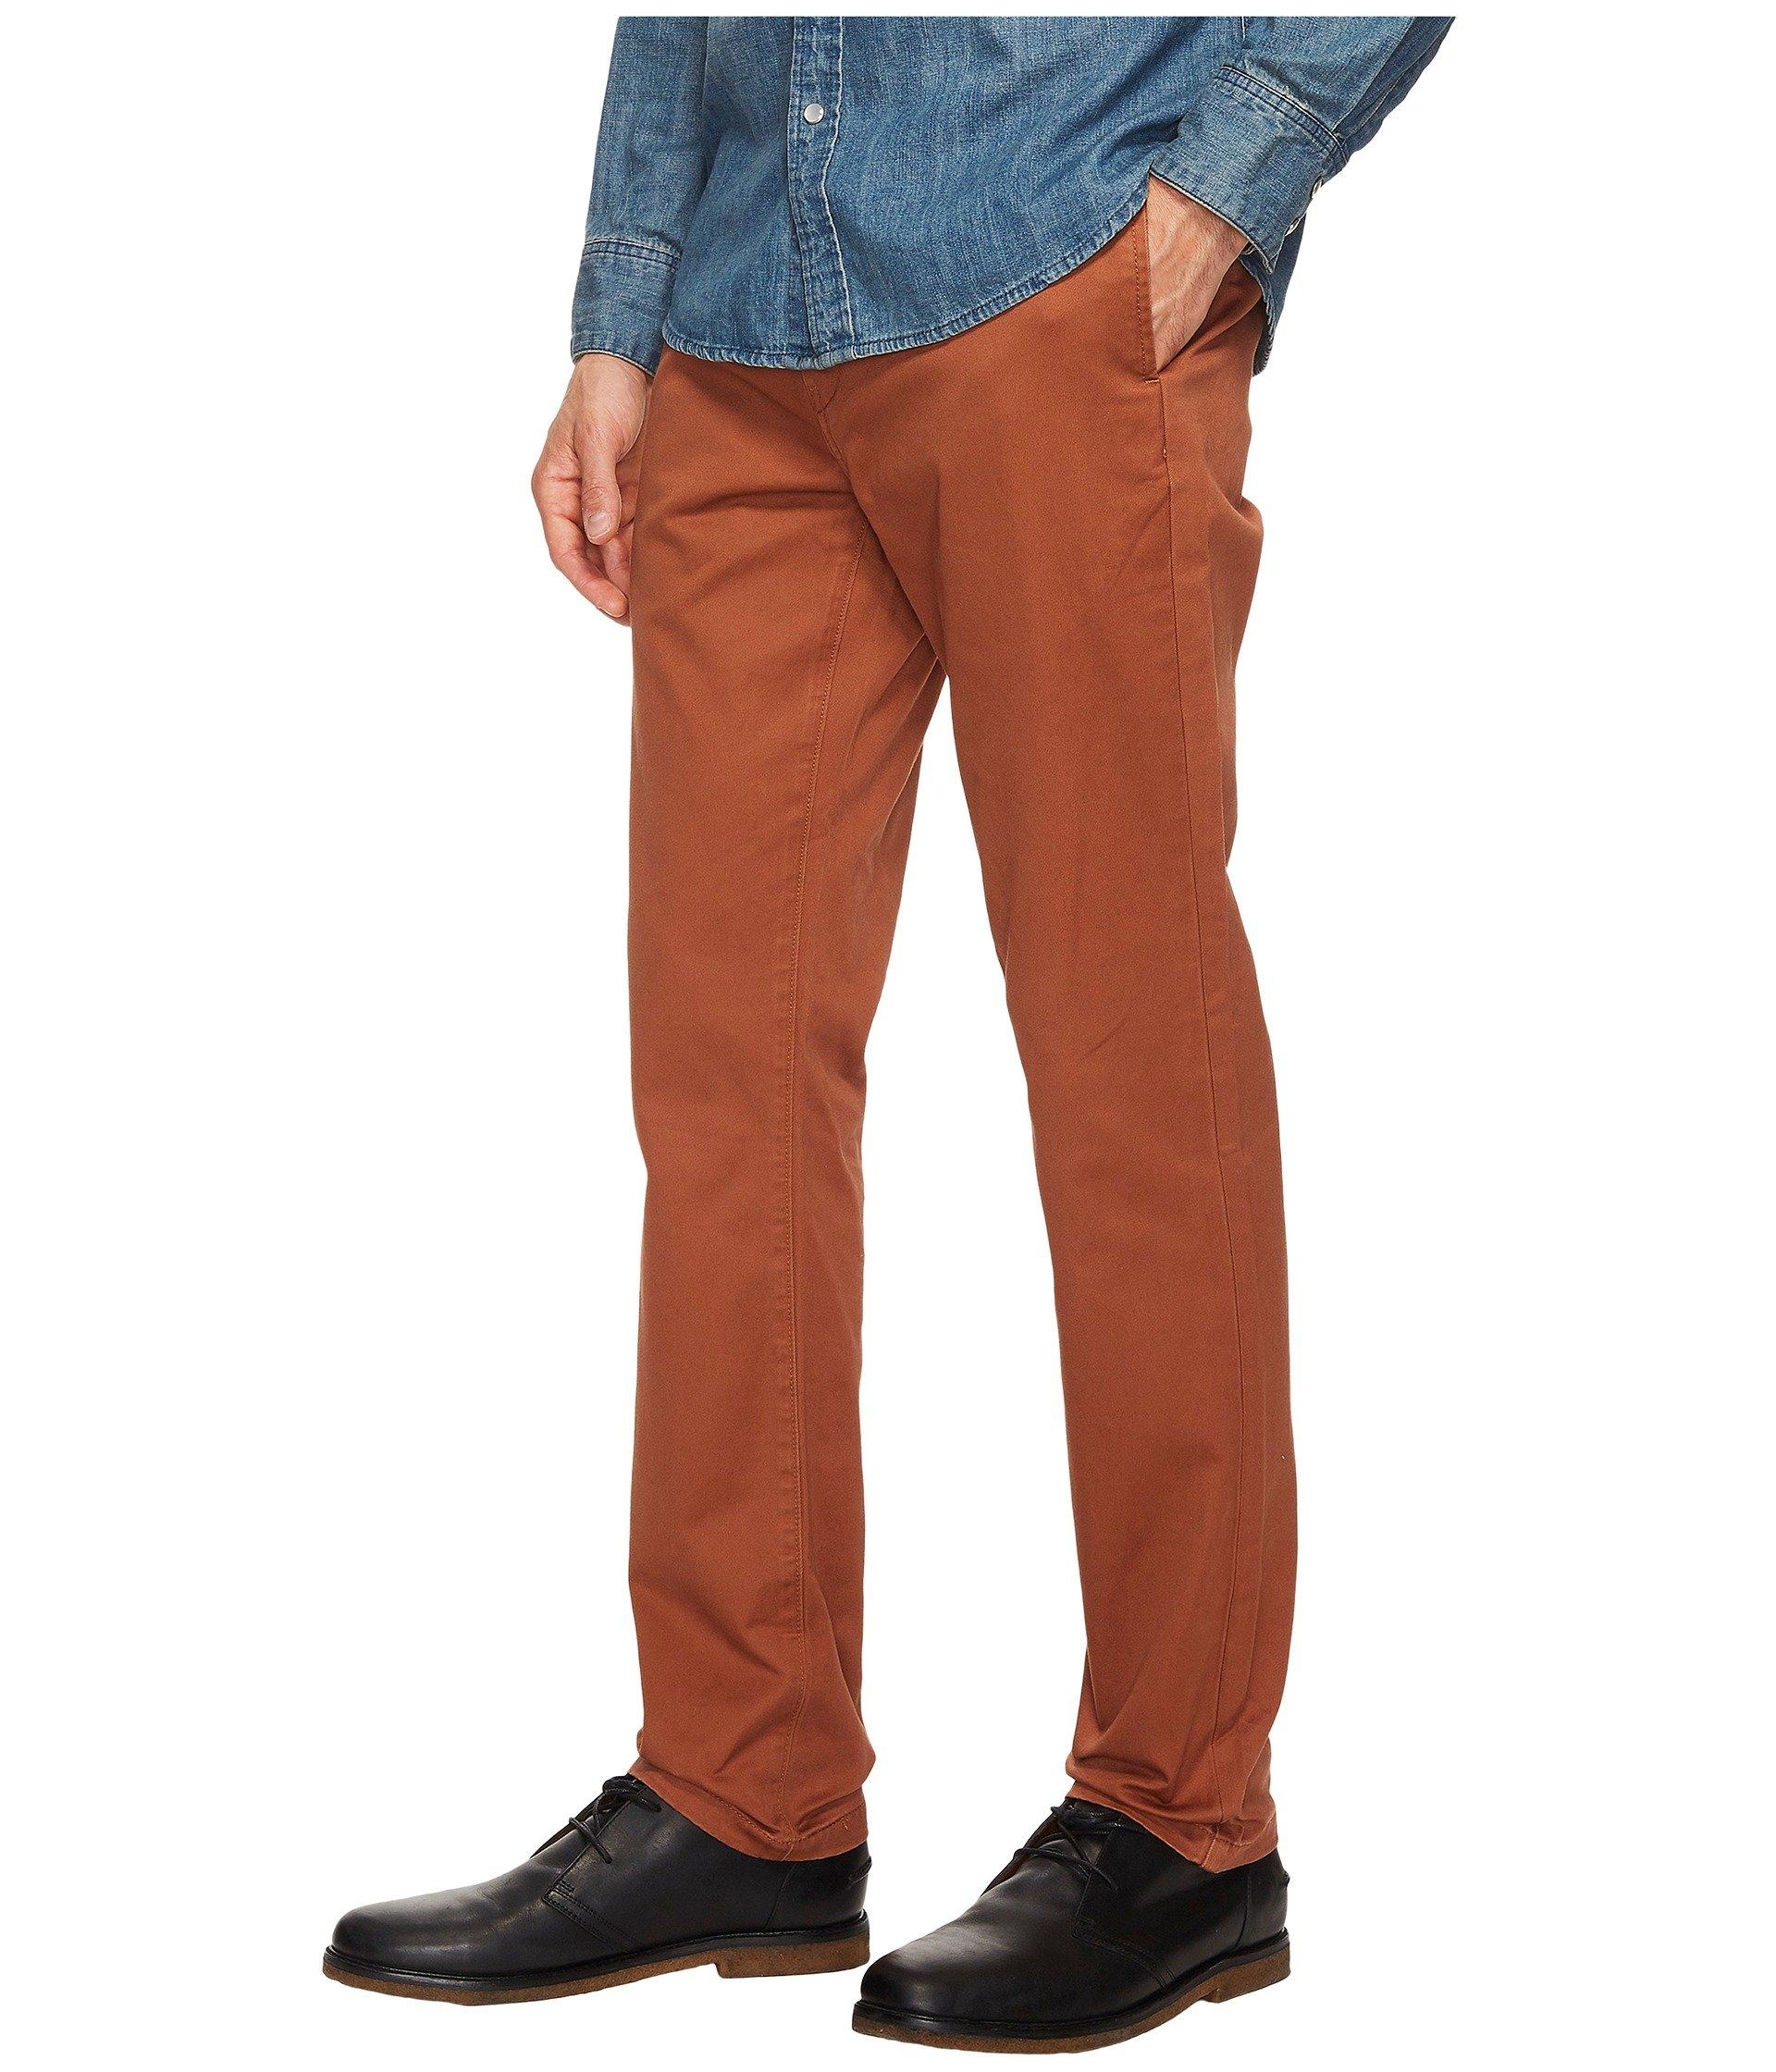 Rich Slim Chino Levi's® Welt Mens 511 Twill Brown Fit cruz EYPxxZqwC